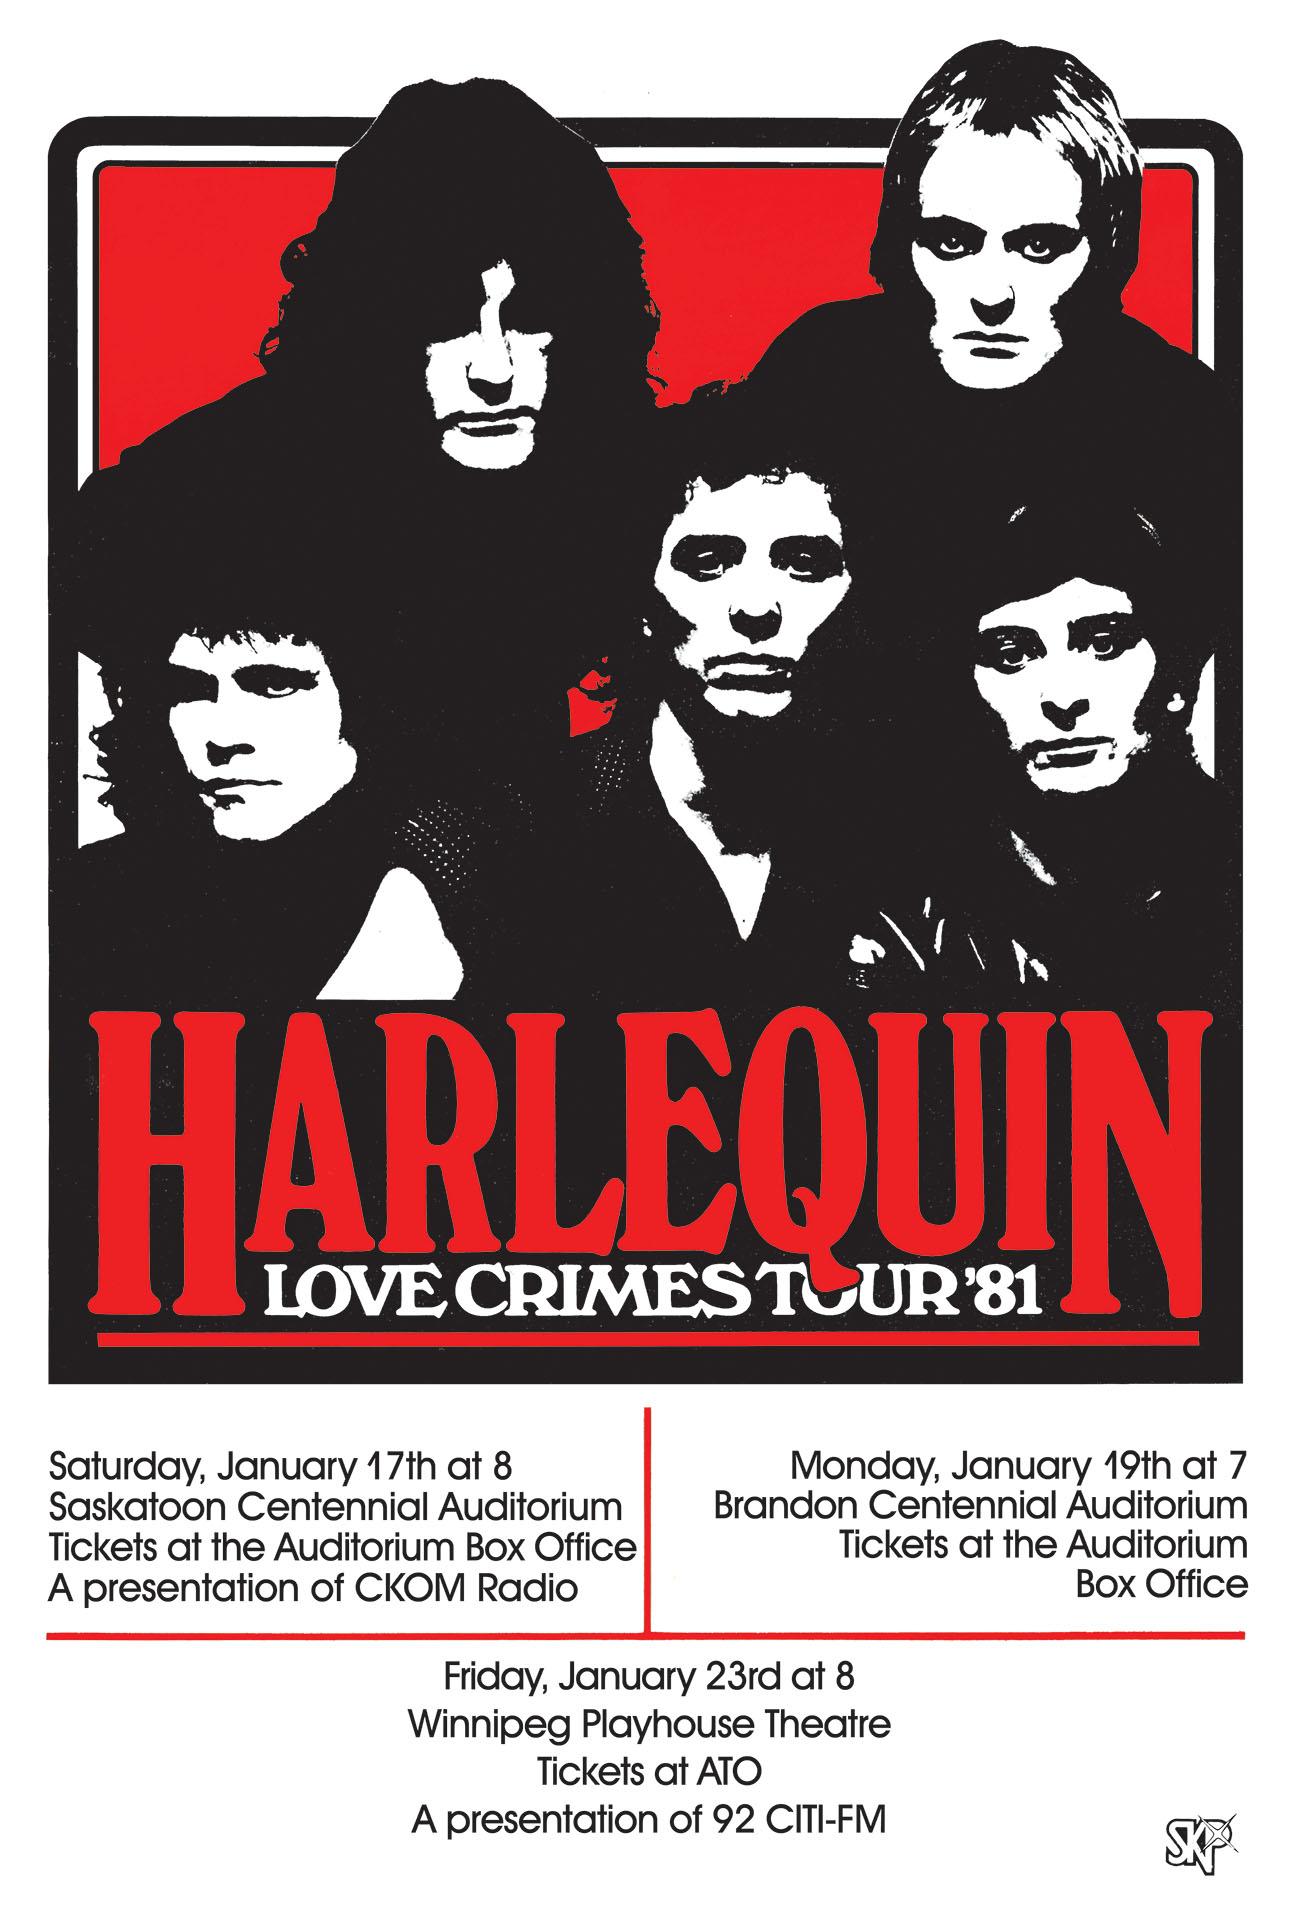 HARLEQUIN – 1981